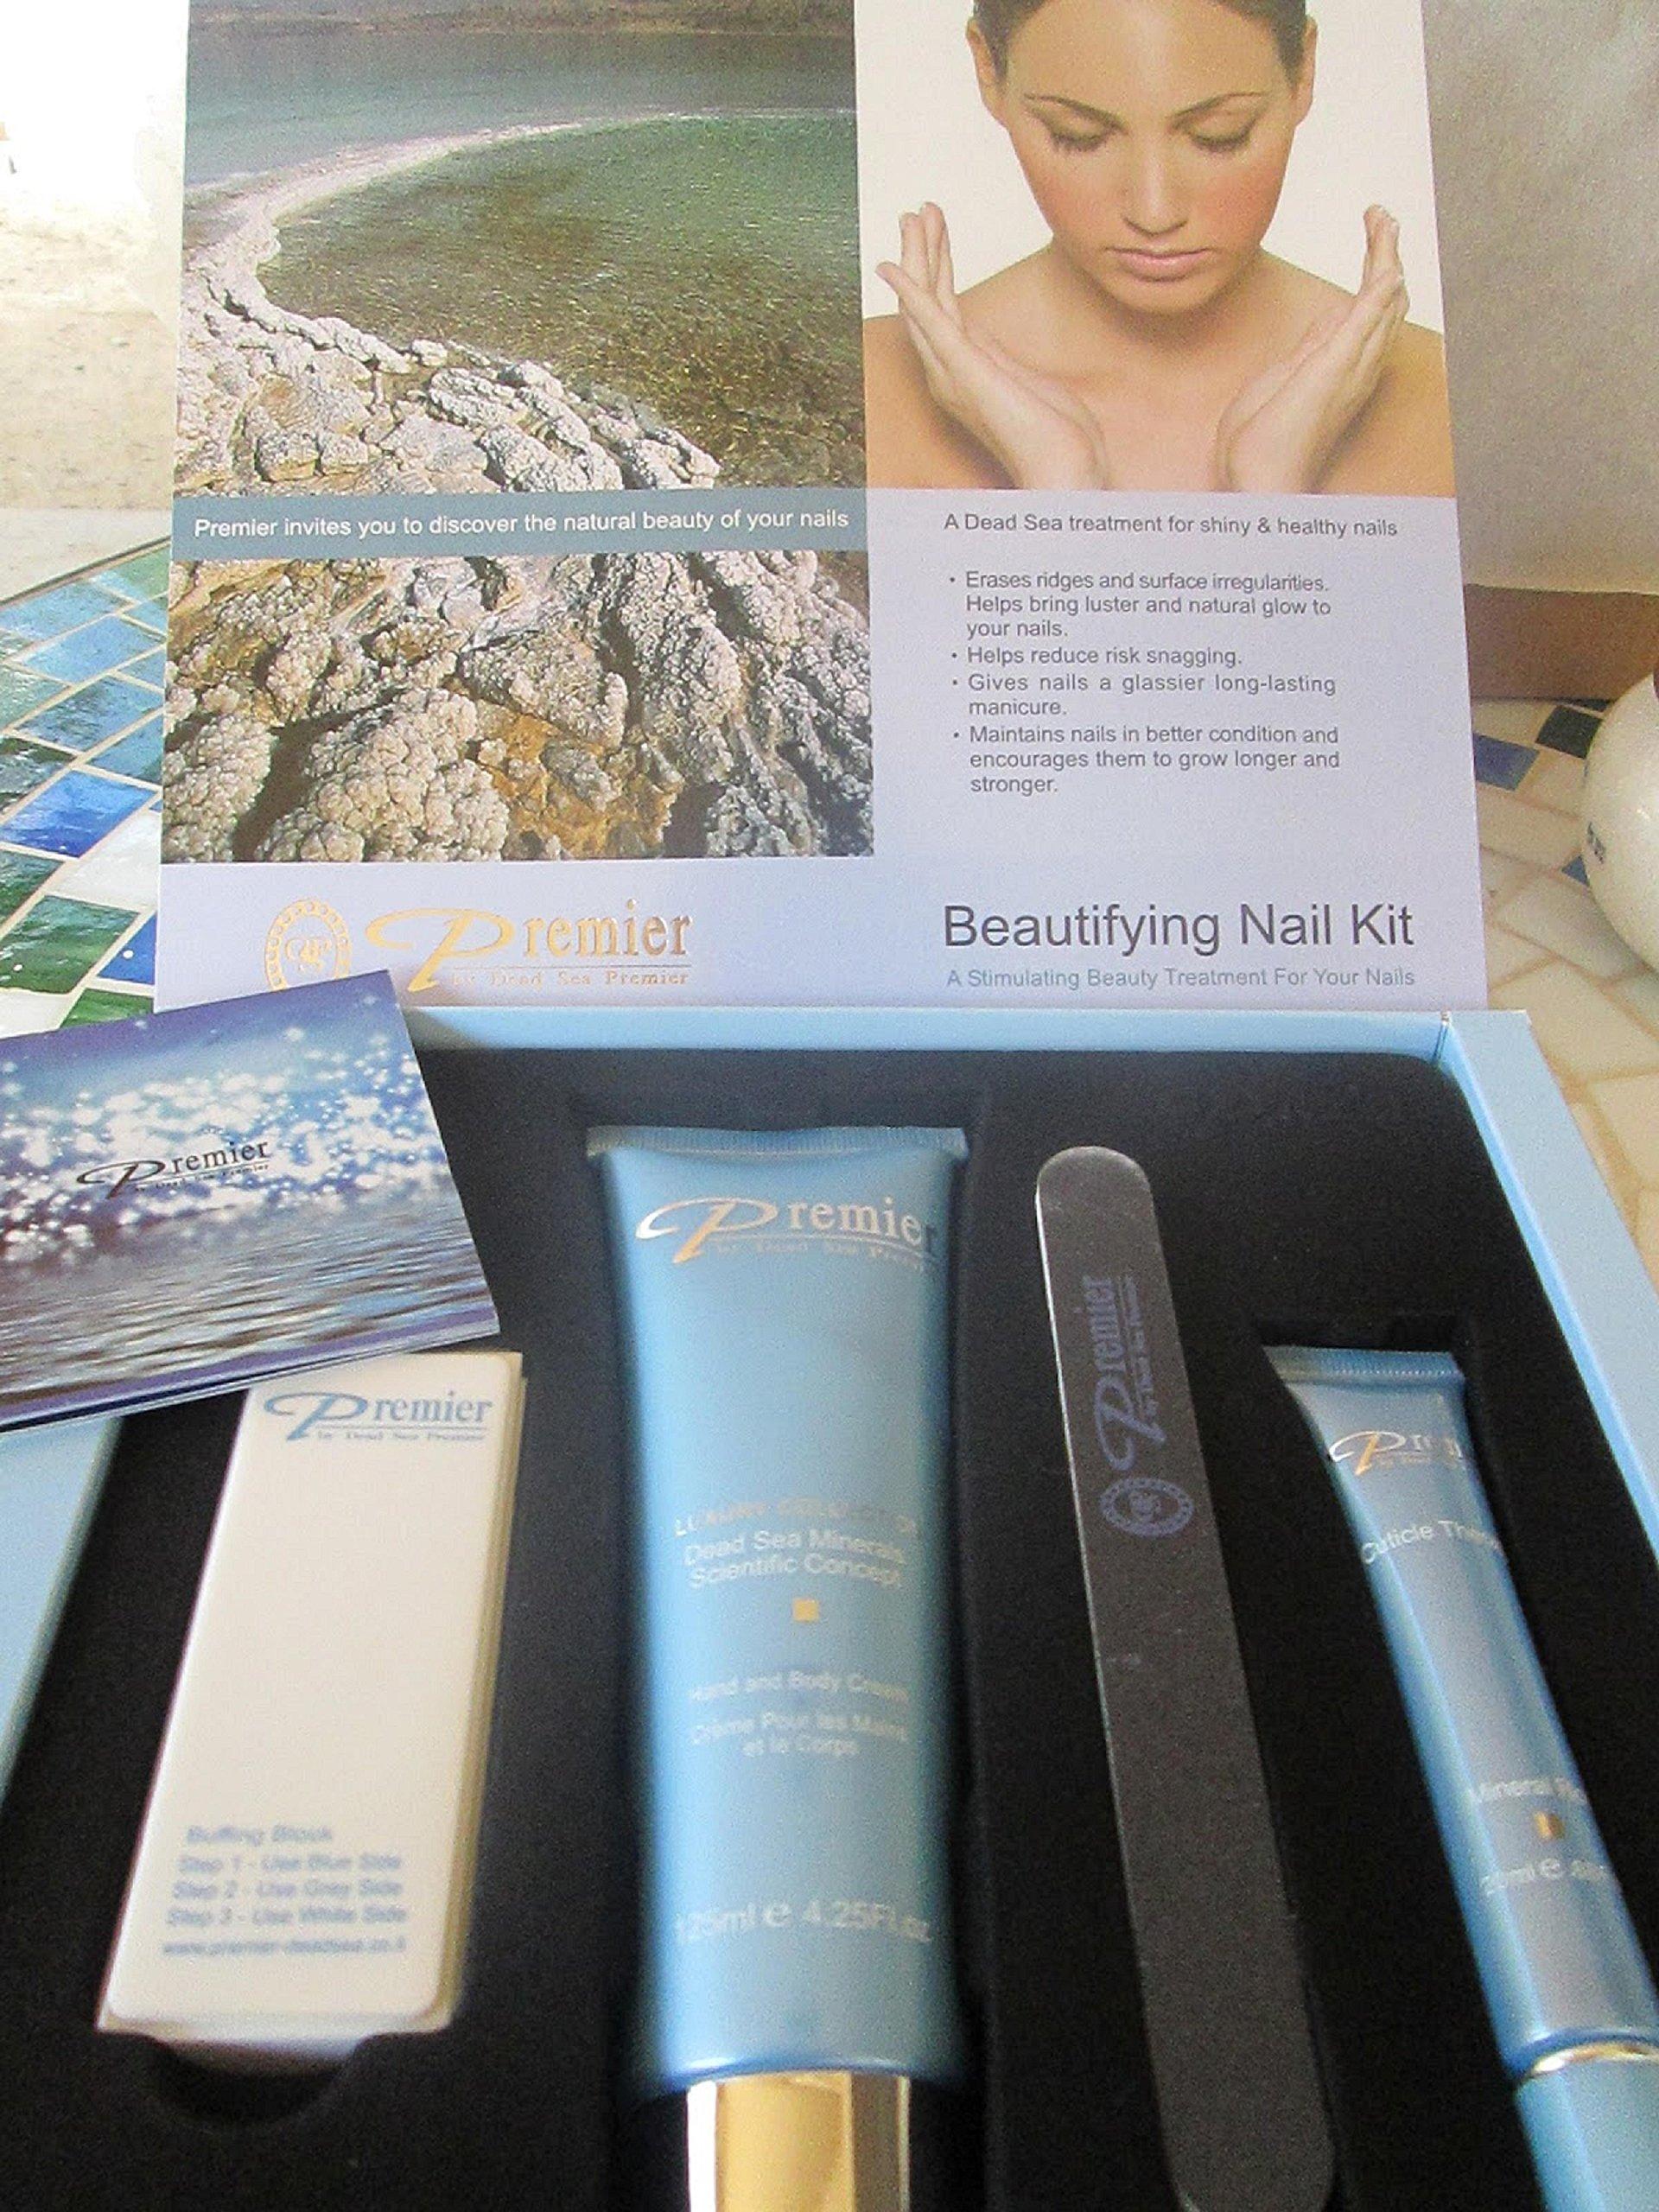 Amazon.com : Premier Dead Sea New Beautifying Nail Kit, Passion ...